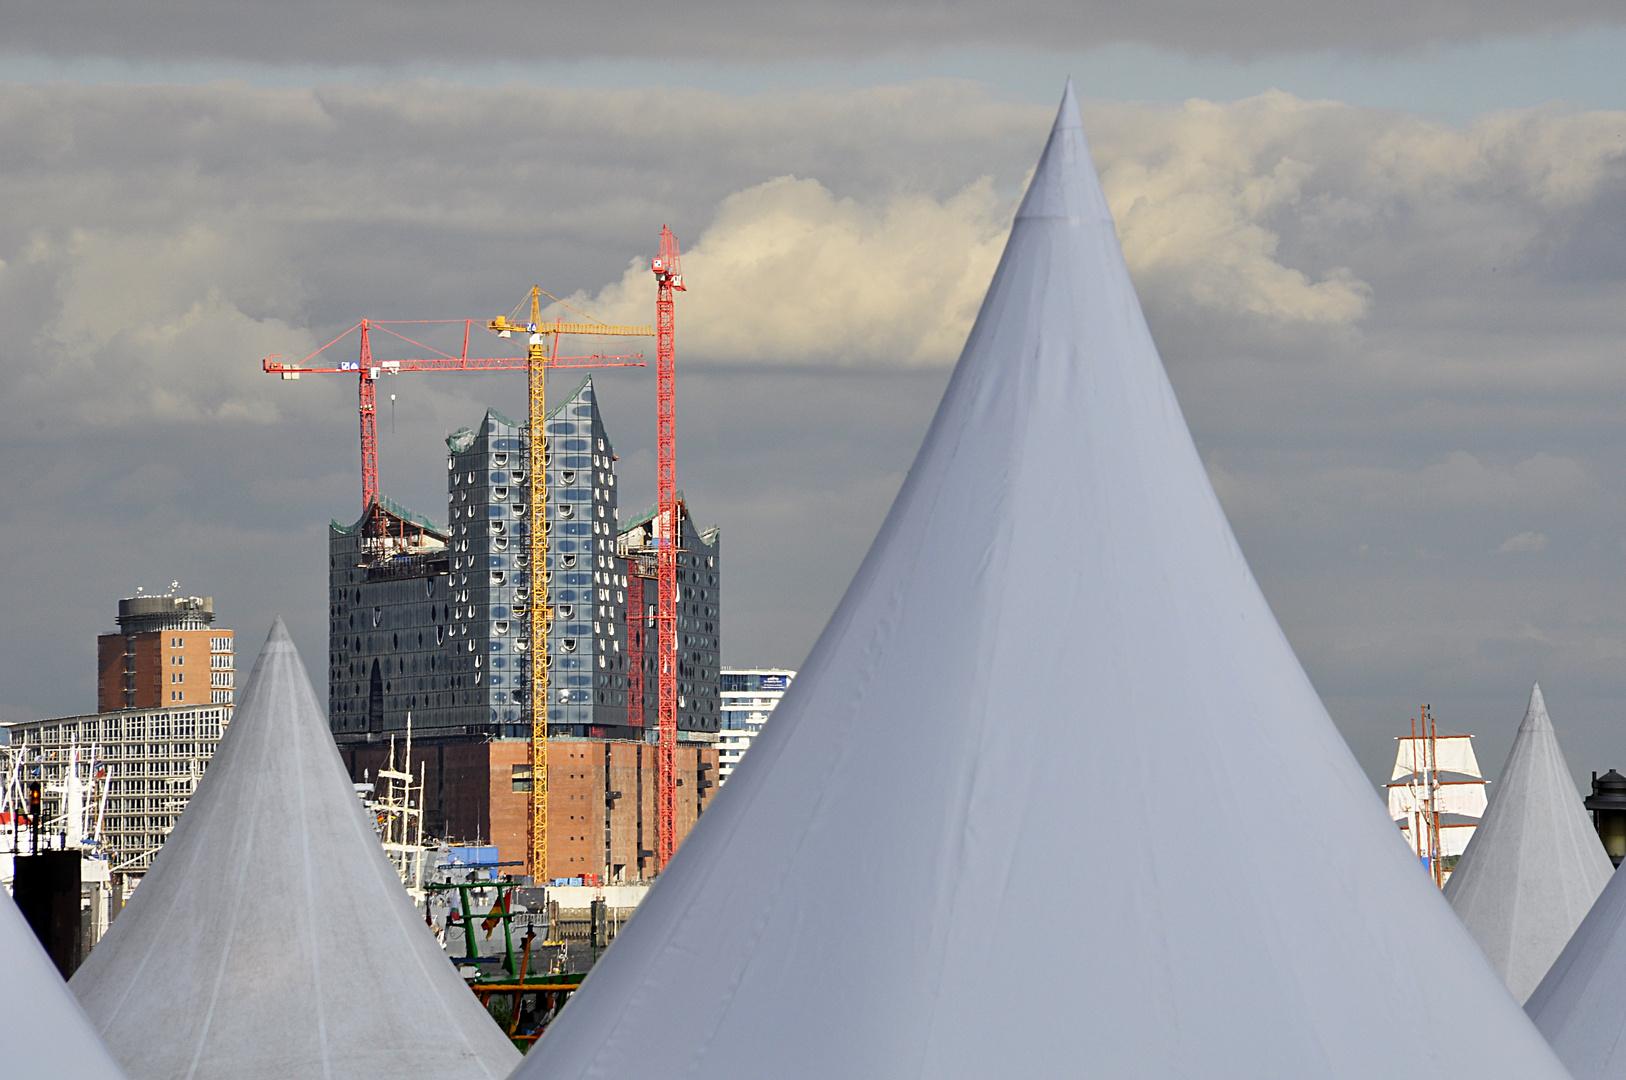 Hamburger Hafengeburtstag 2012 - Elbphilharmonie